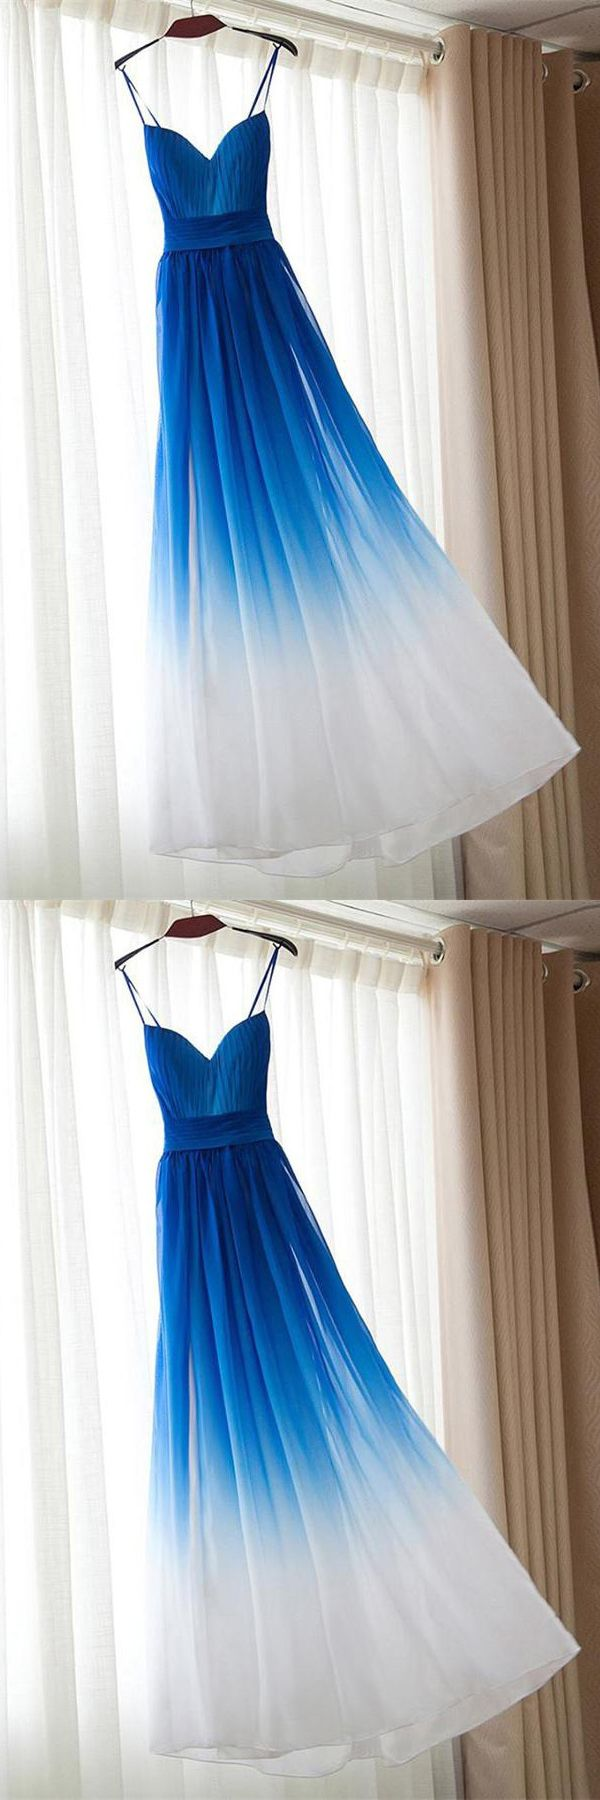 Spaghetti straps long prom dressesroyal blue and white prom dress